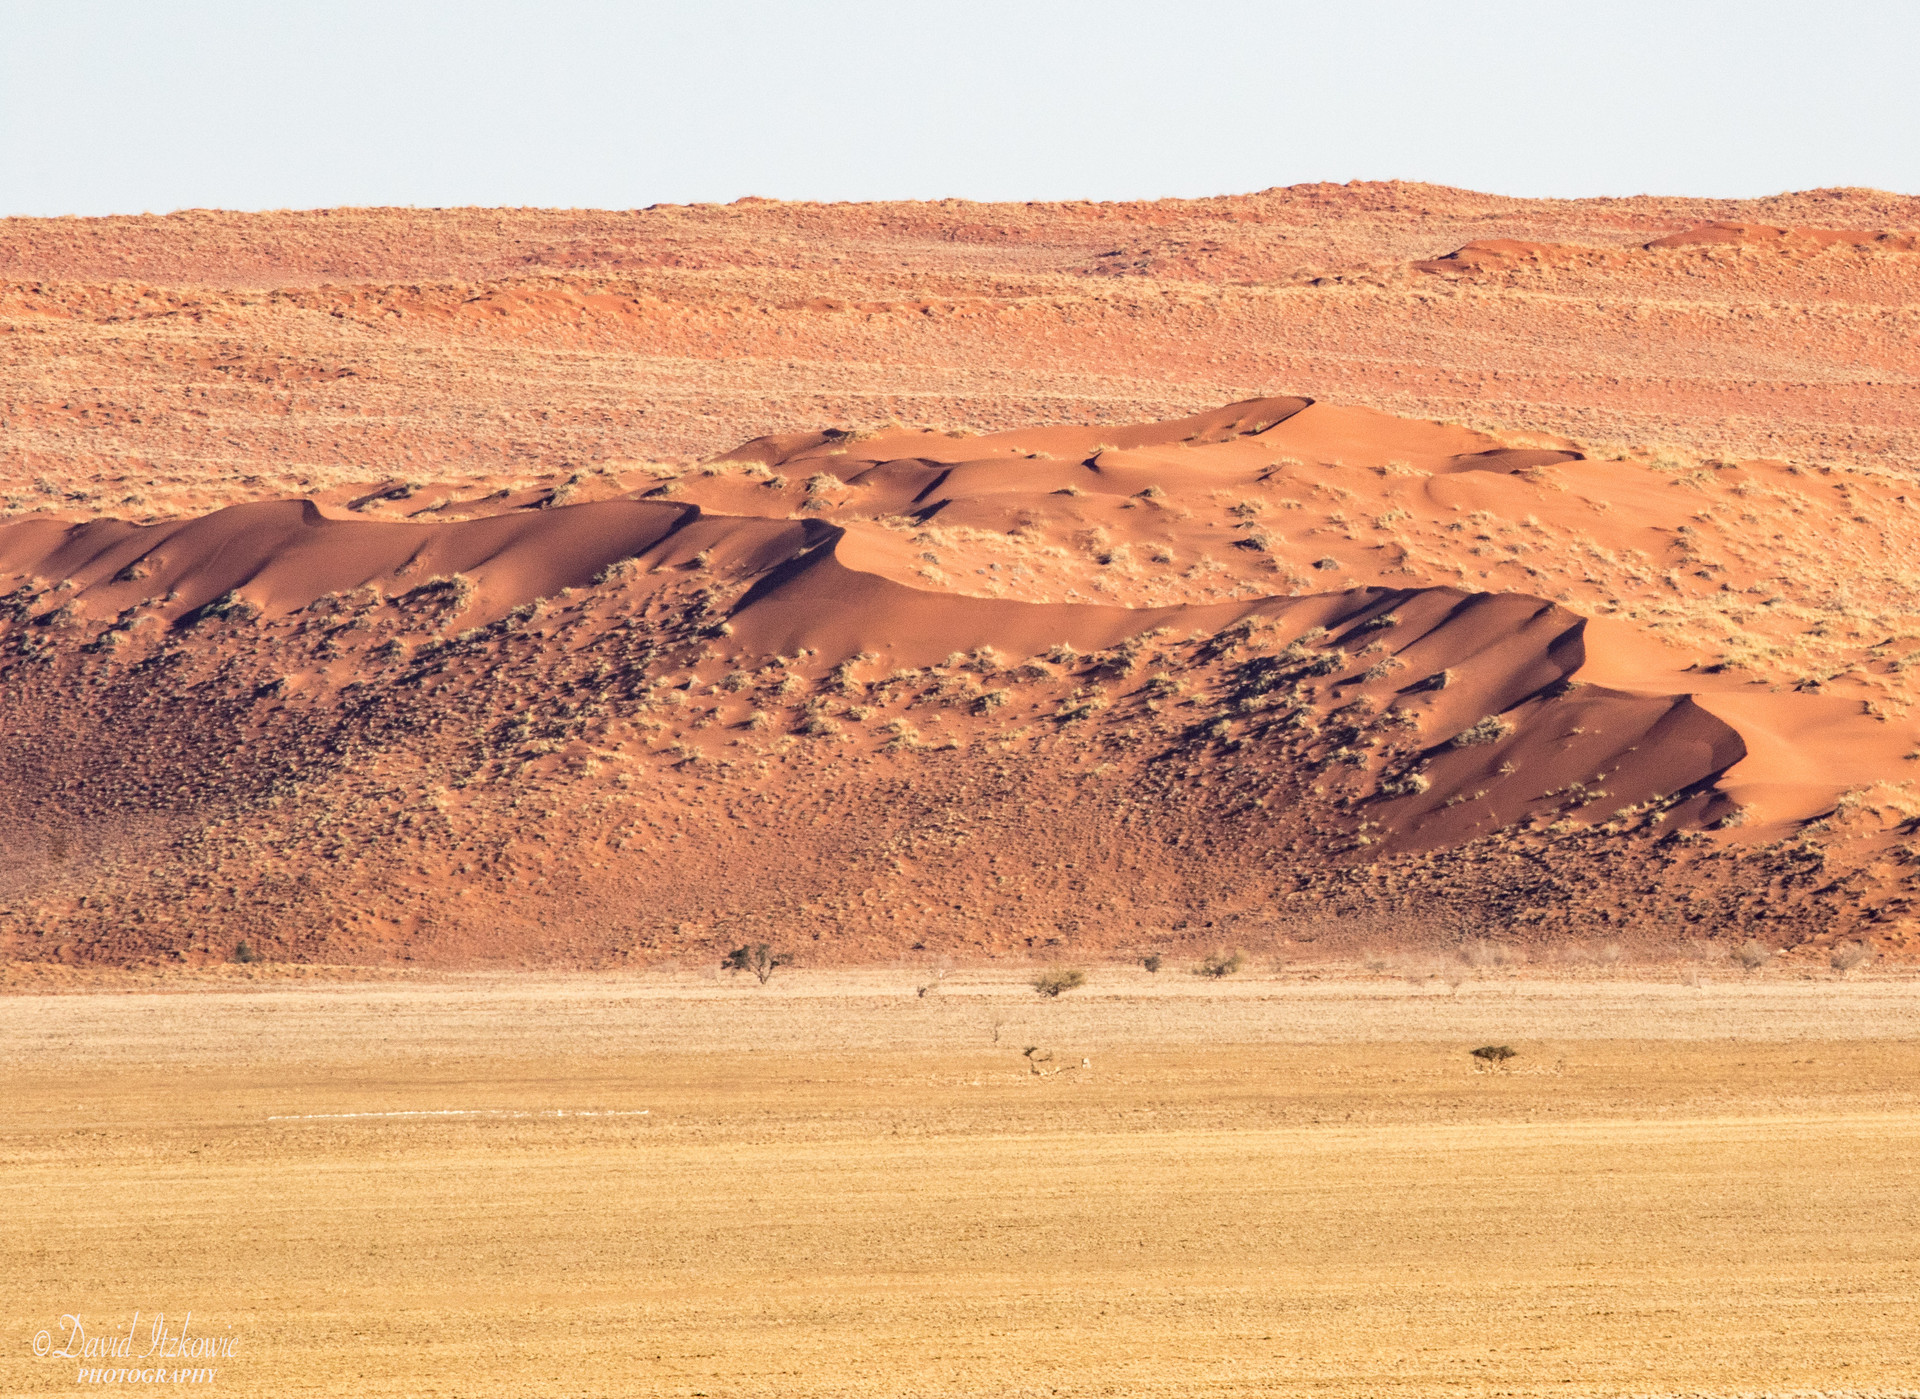 Dune and petrified dune